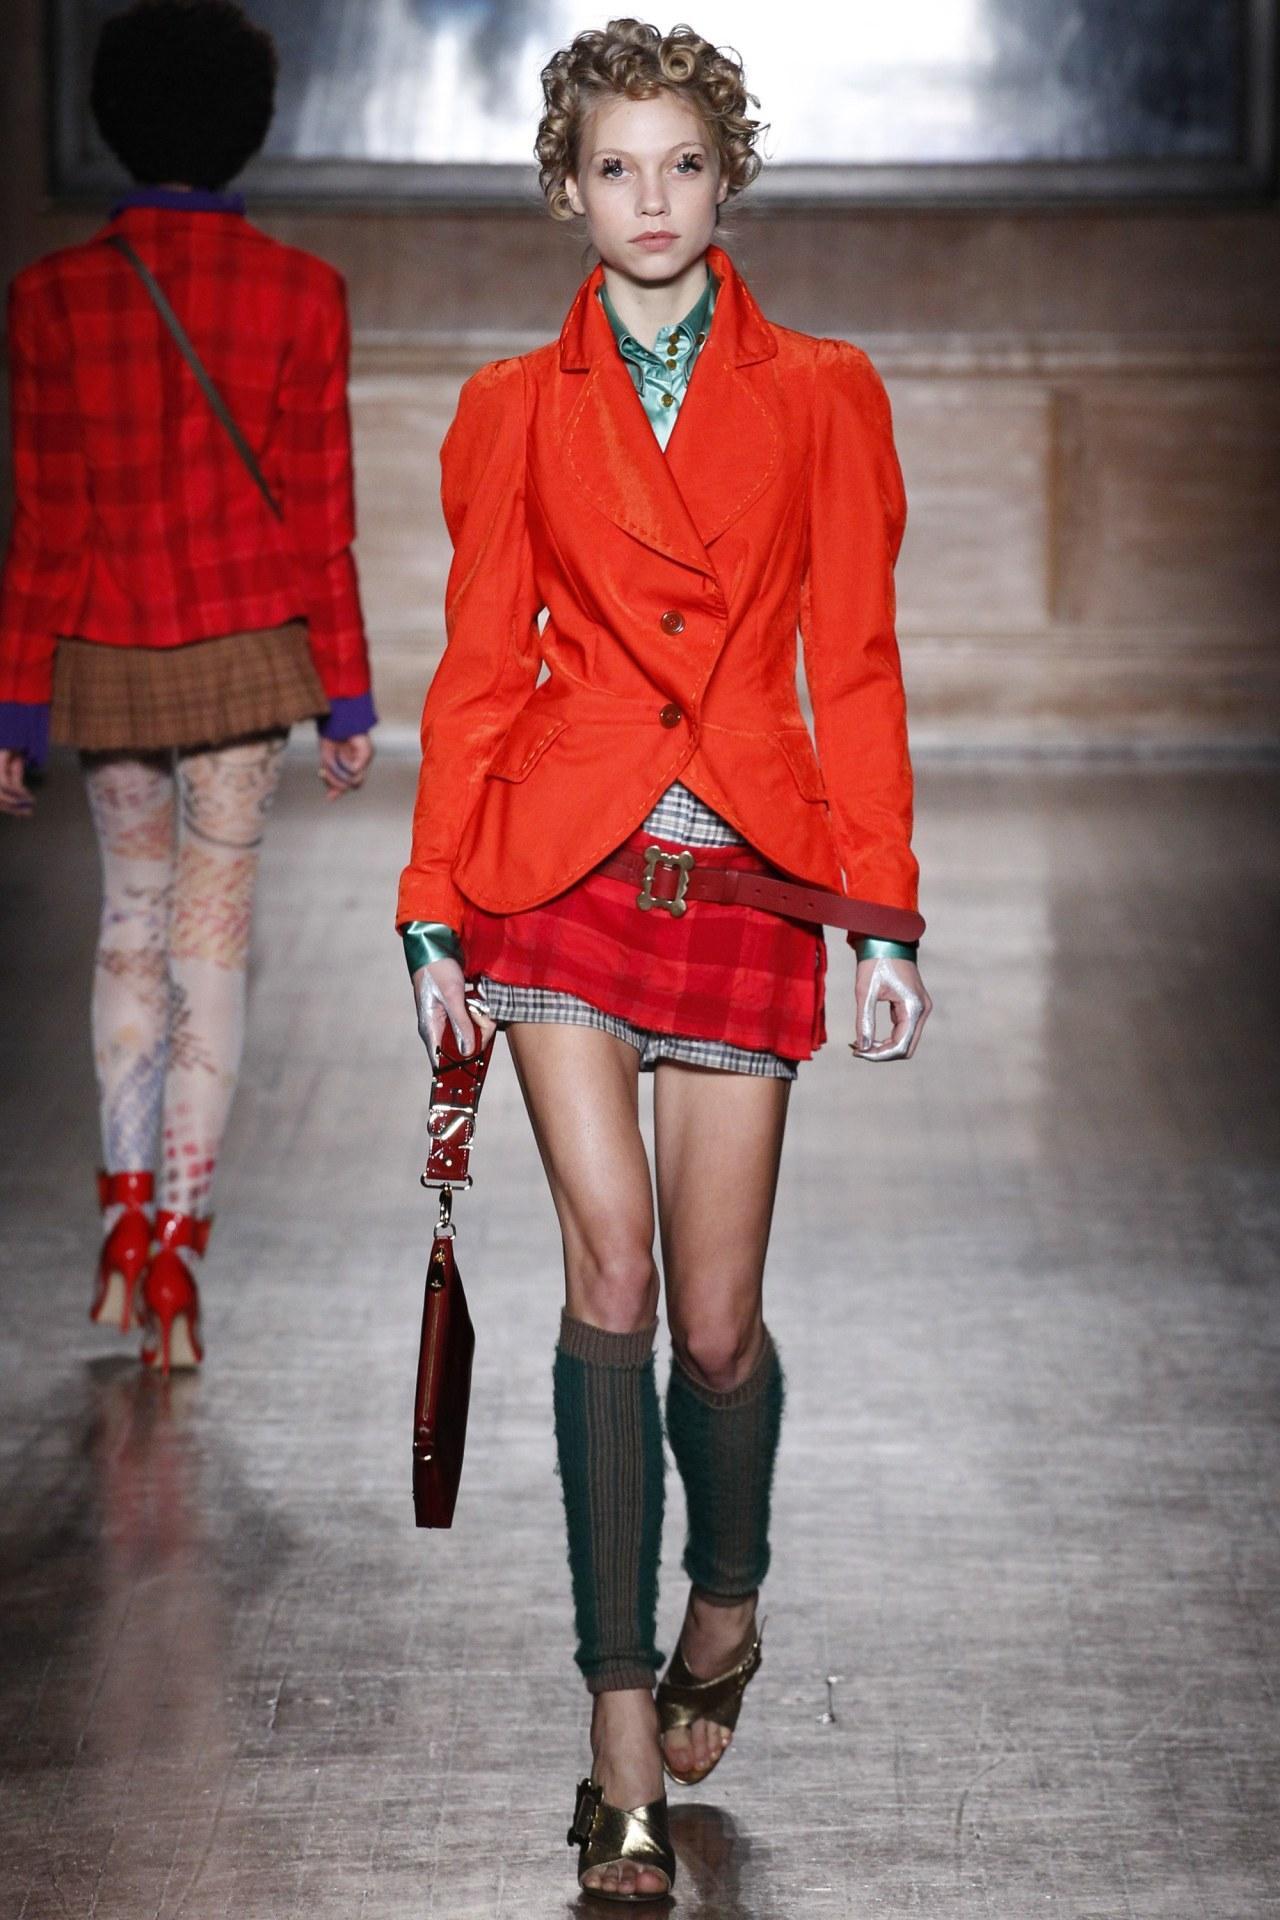 Laura Schellenberg at Vivienne Westwood Red Label, Fall 2016 #Laura Schellenberg #Vivienne Westwood Red Label #models#fashion#runway#Fall 2016